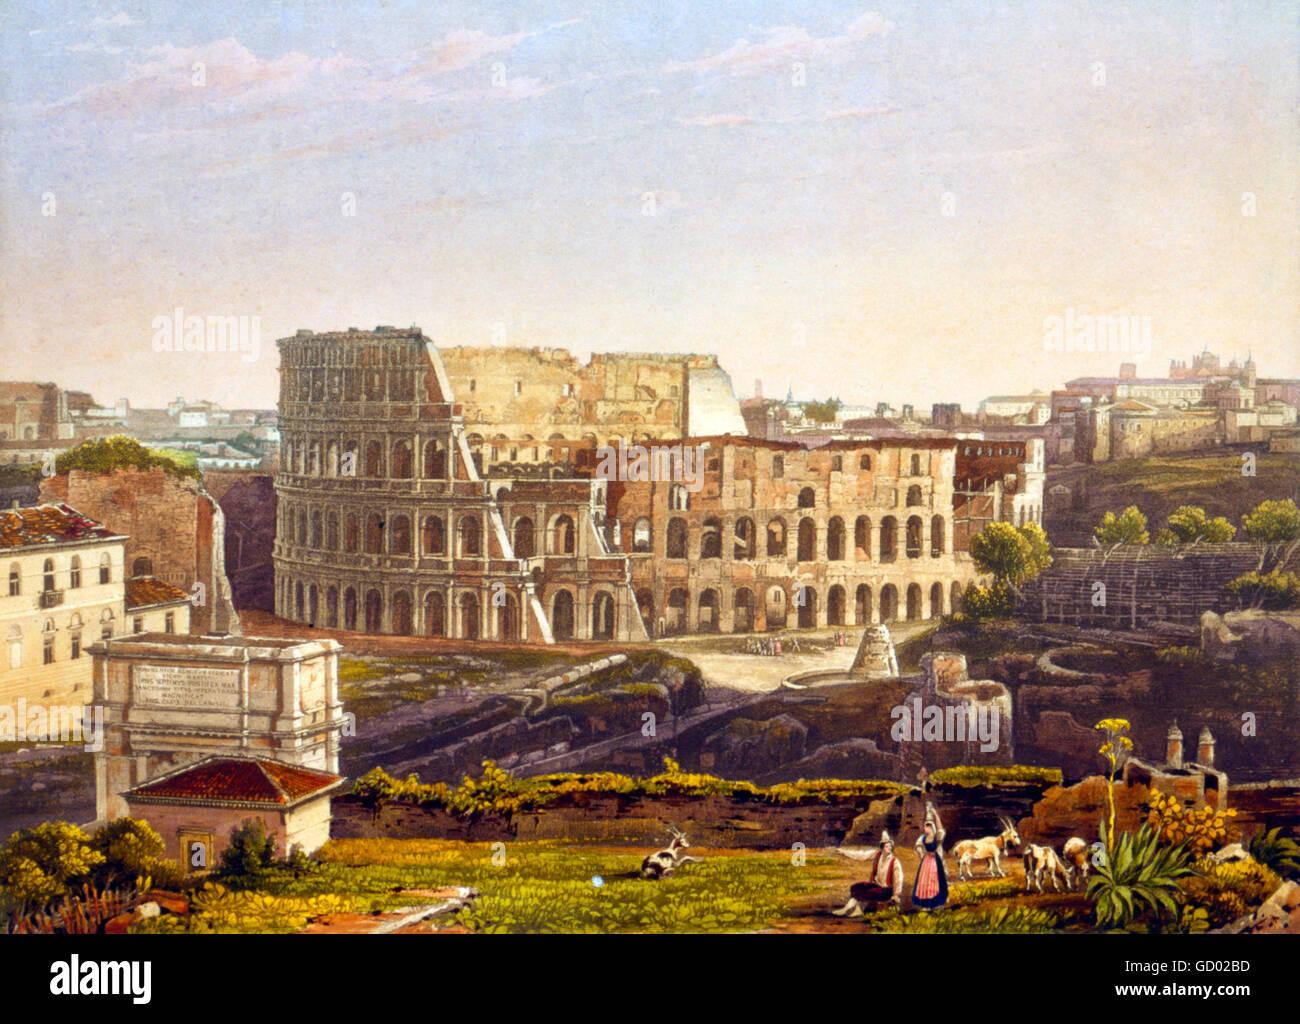 Coliseo de Roma. Siglo xix vista del Coliseo de Roma. Aguafuerte y aguatinta desde un daguerrotype por Noël Imagen De Stock